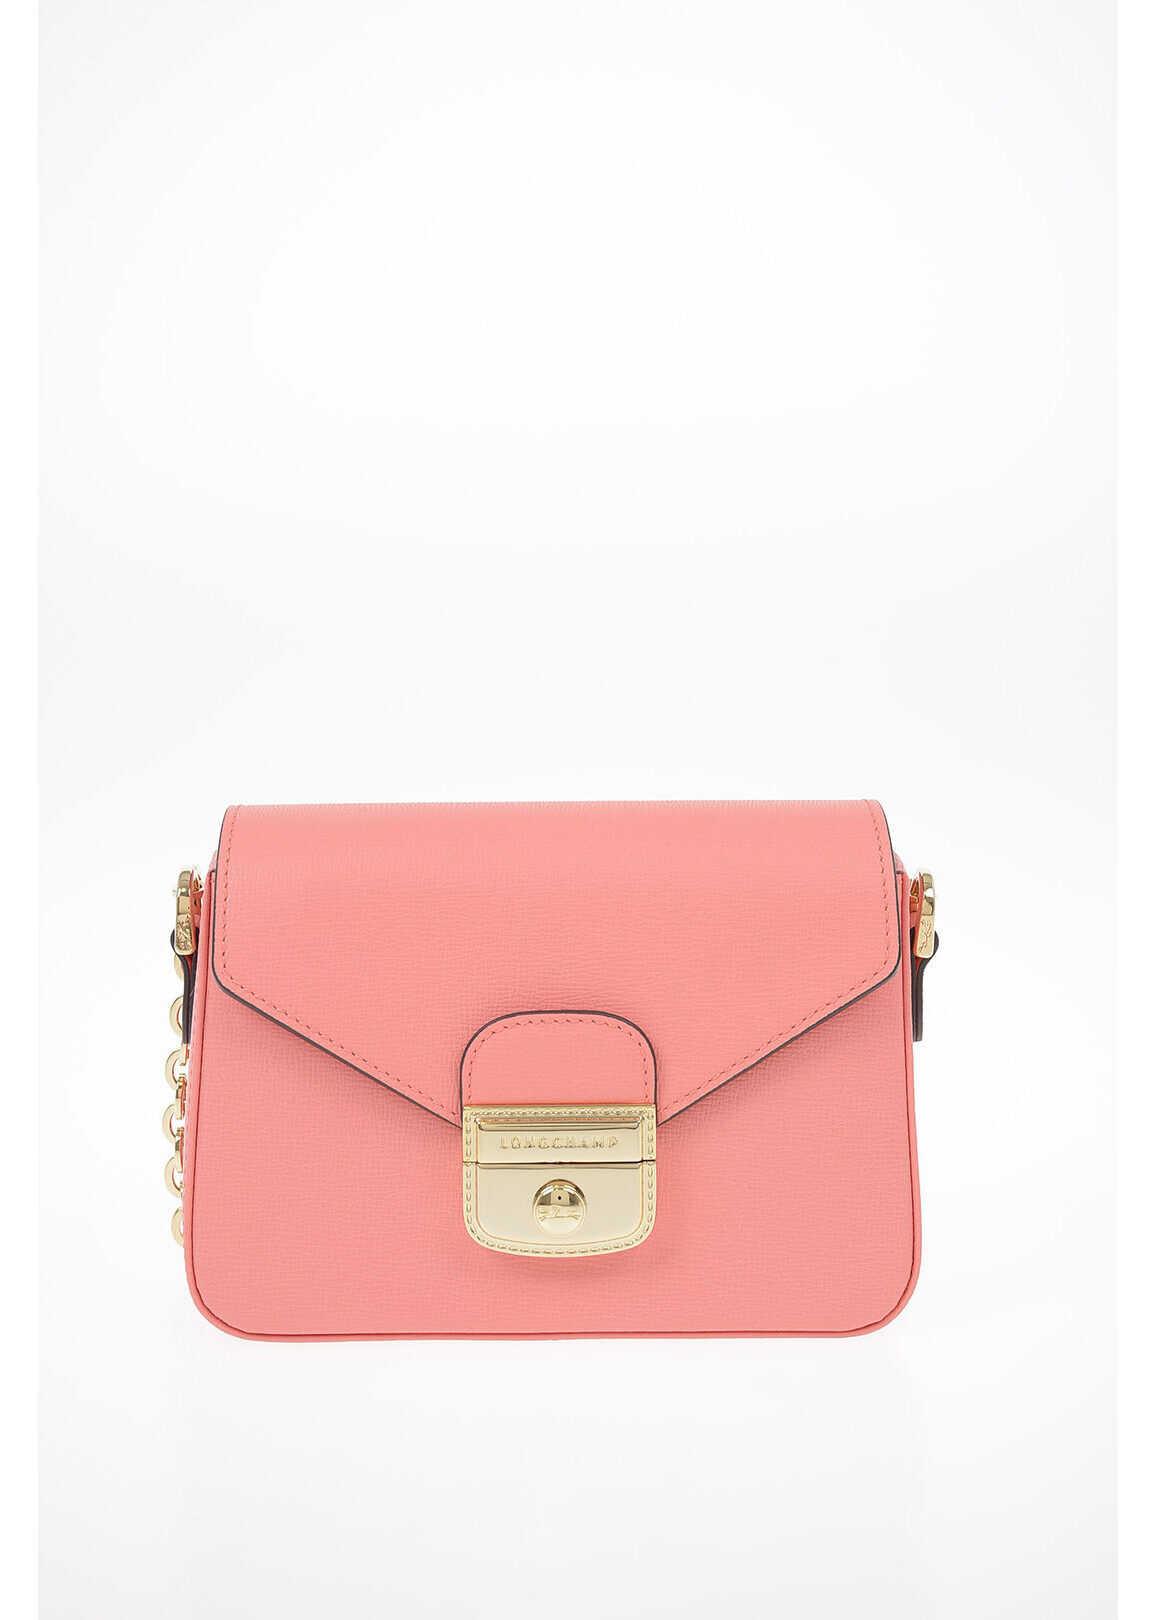 Longchamp Leather Mini Shoulder Bag PINK imagine b-mall.ro